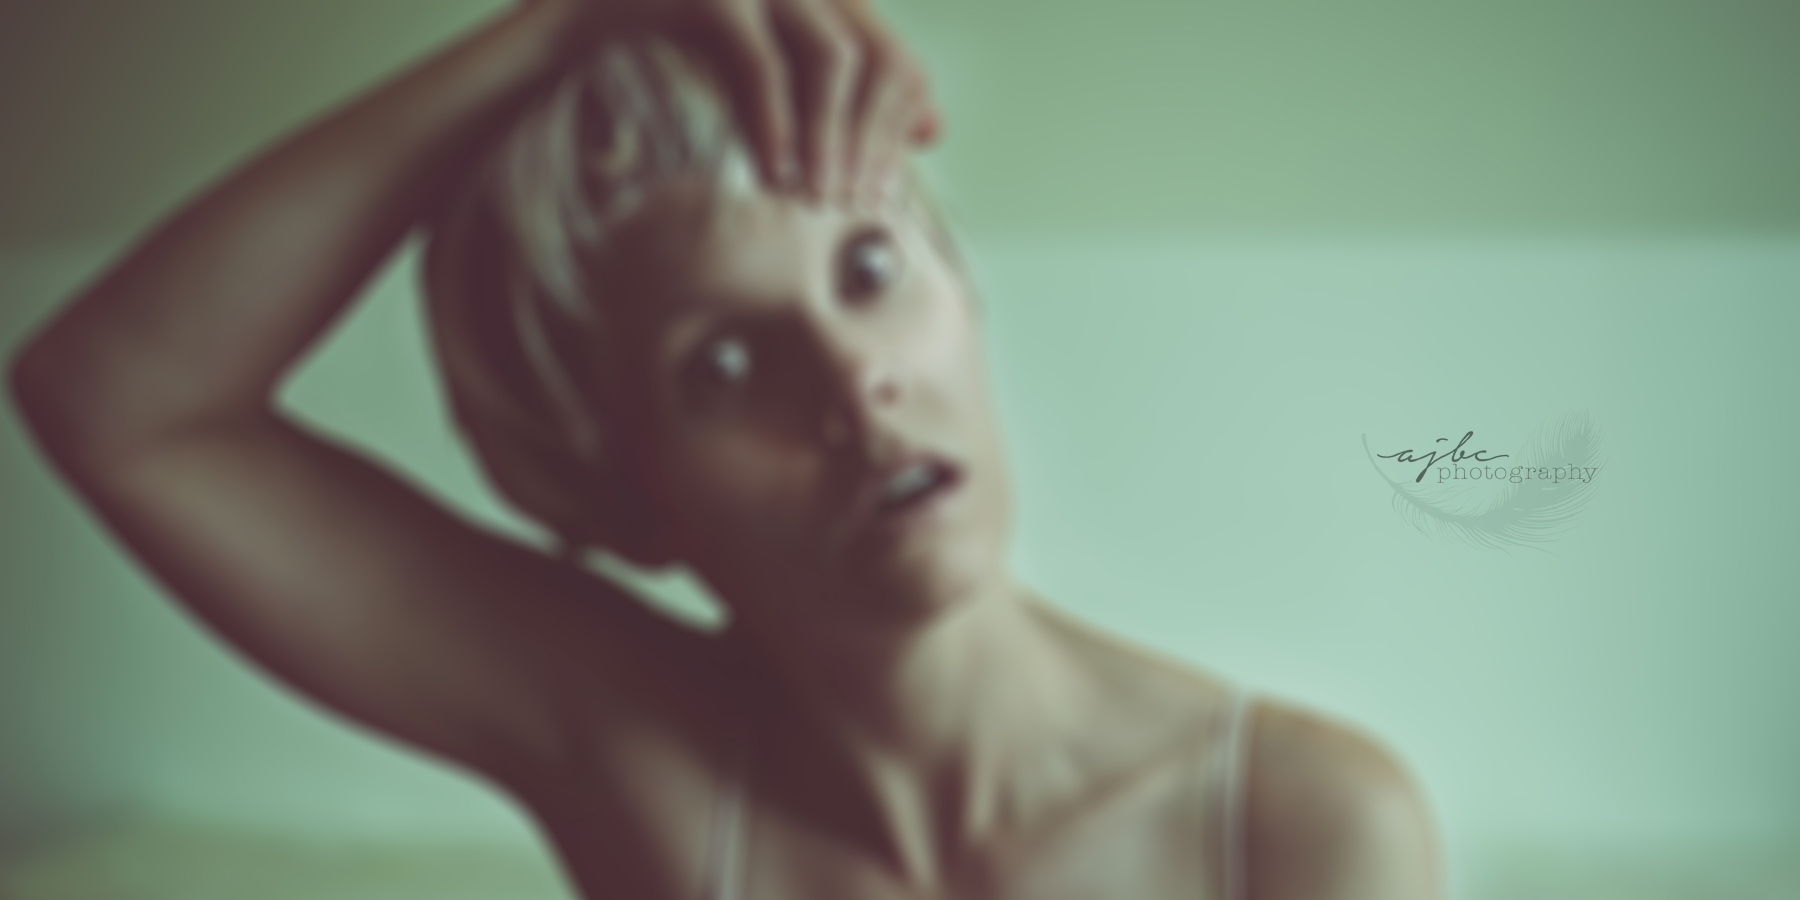 Sia Chandelier Art Detroit Photographer studio.png